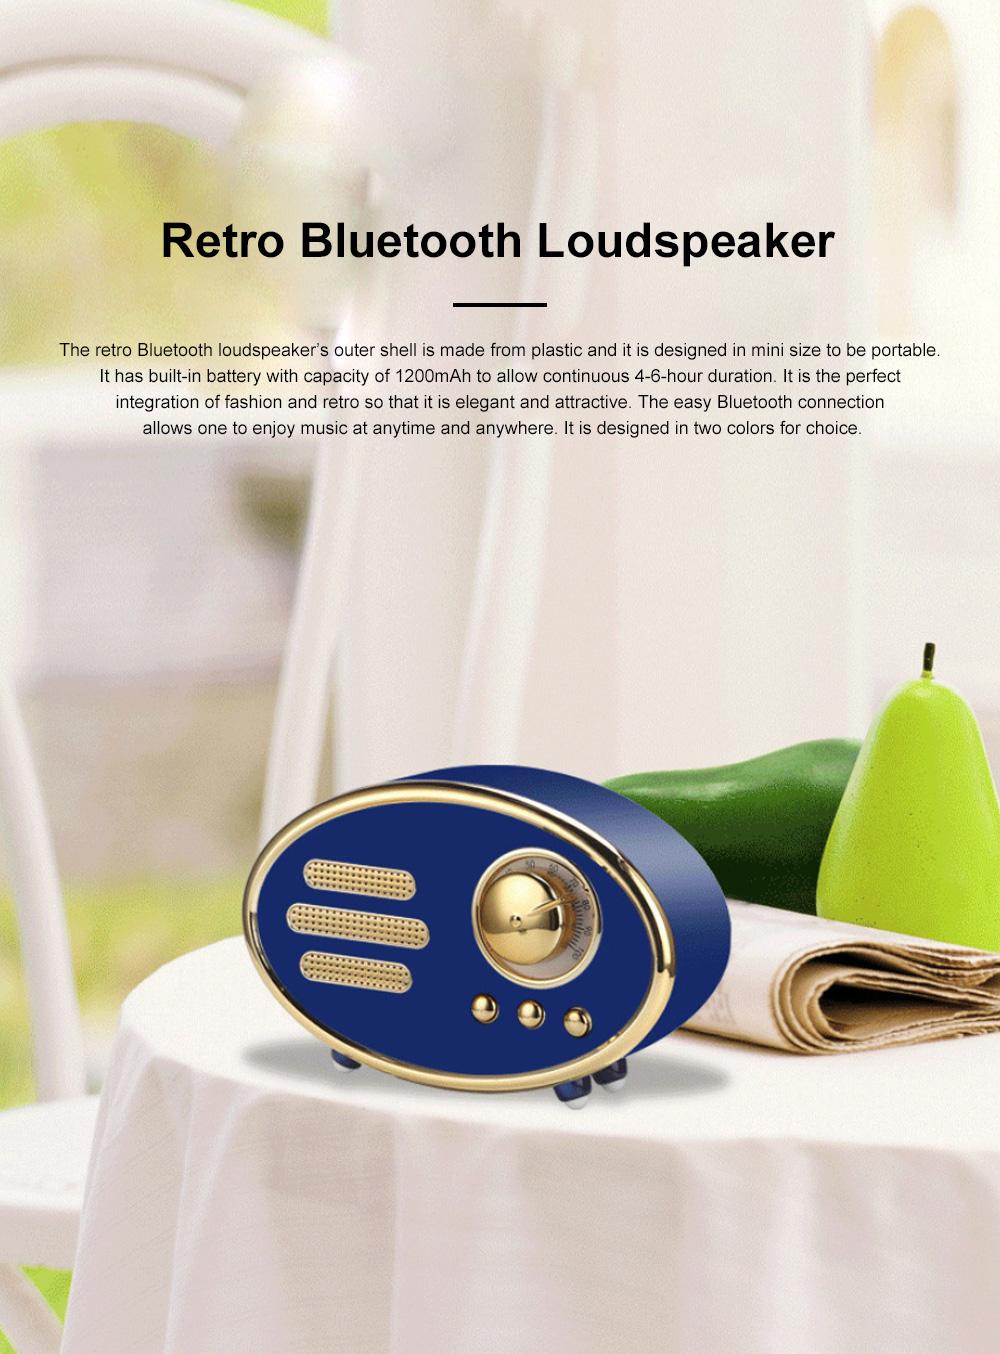 Retro Plastic Bluetooth Loudspeaker with FM Radio Receiver Portable Wireless Baffle Box Durable Mini Speaker Nice-looking Loudspeaker Box 0